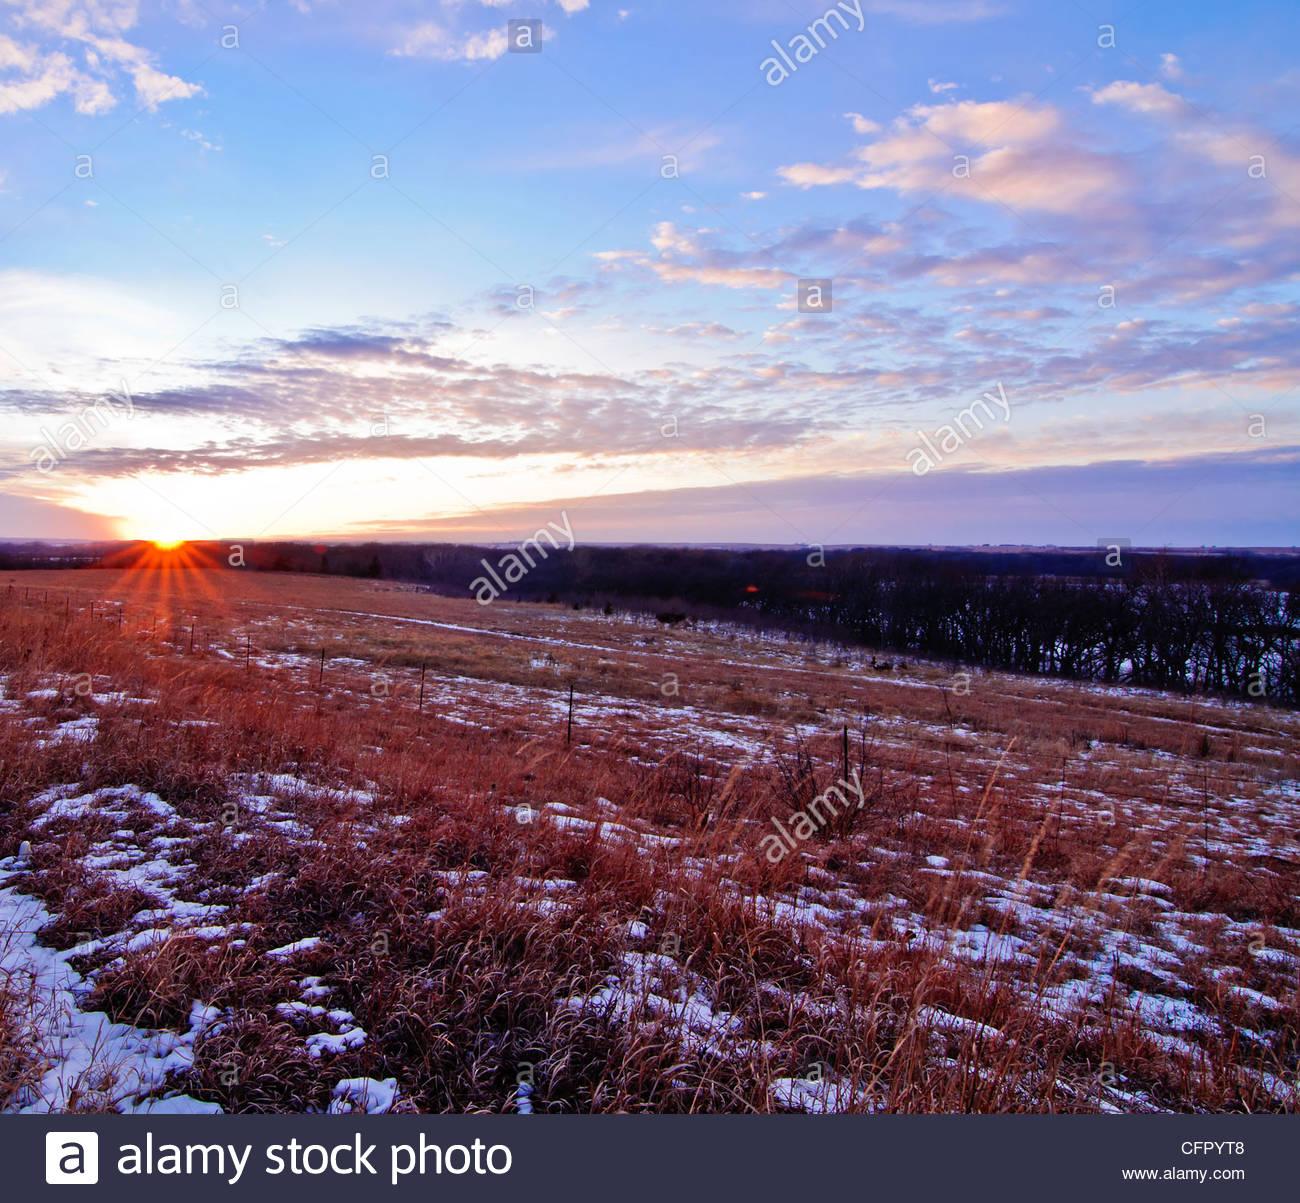 Sunset Along Snowy Flint Hills Nature Trail, Flint Hills East of Council Grove, KS - Stock Image